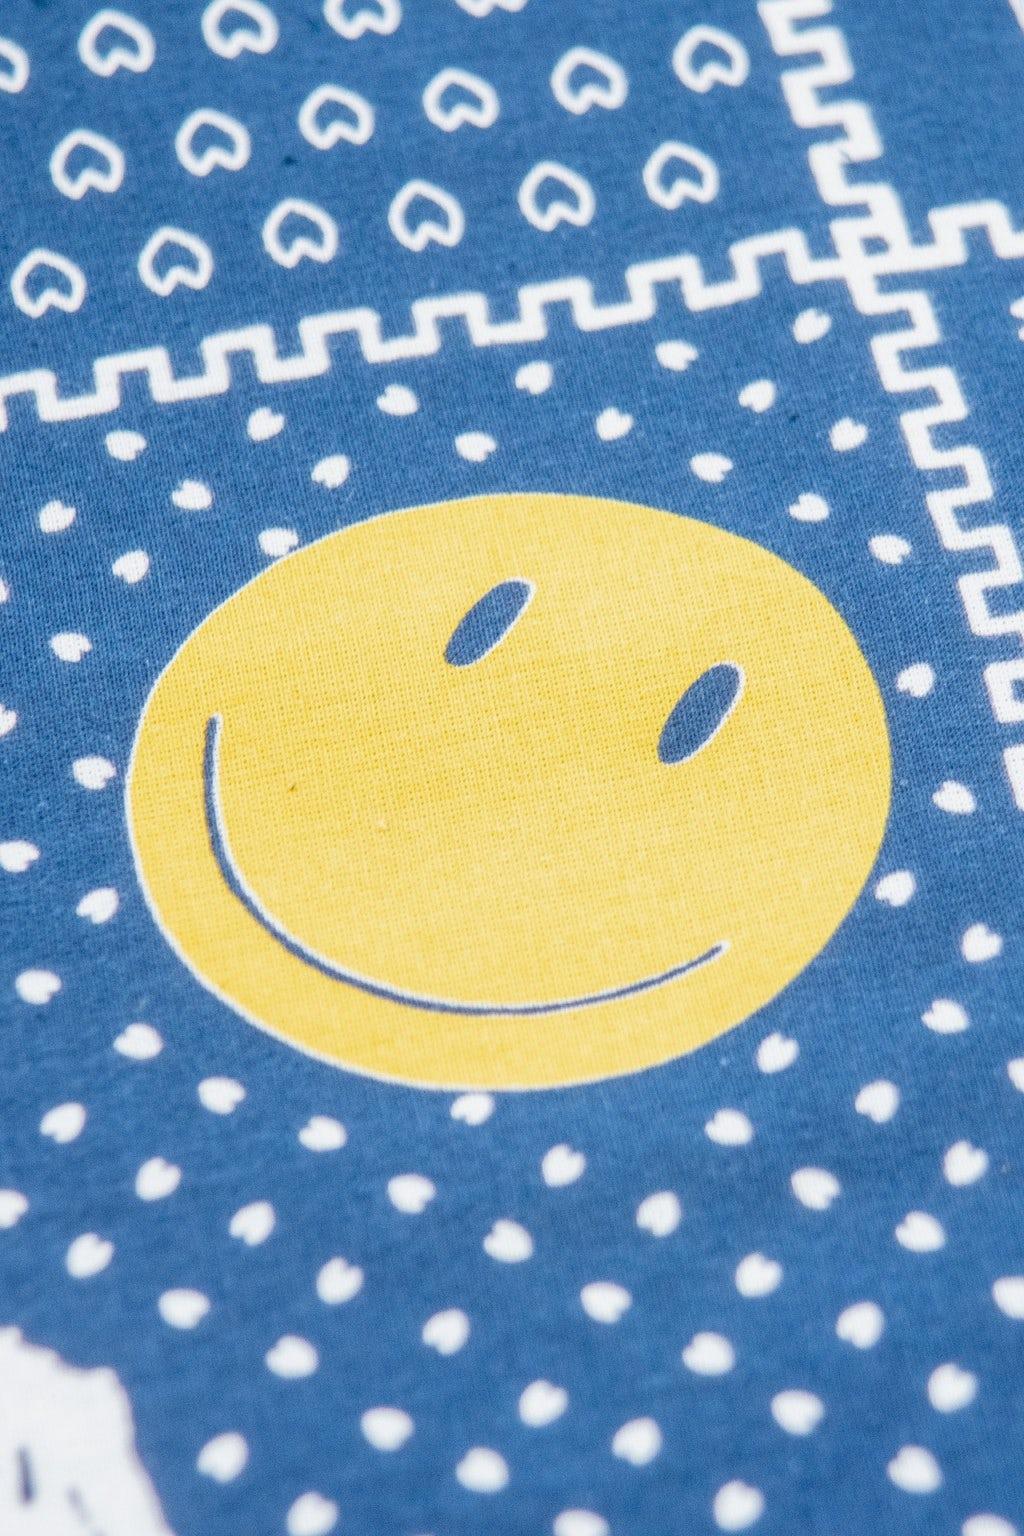 Kapital Fastcolor Selvedge Bandana (Mirrored FUJI Smile) Navy